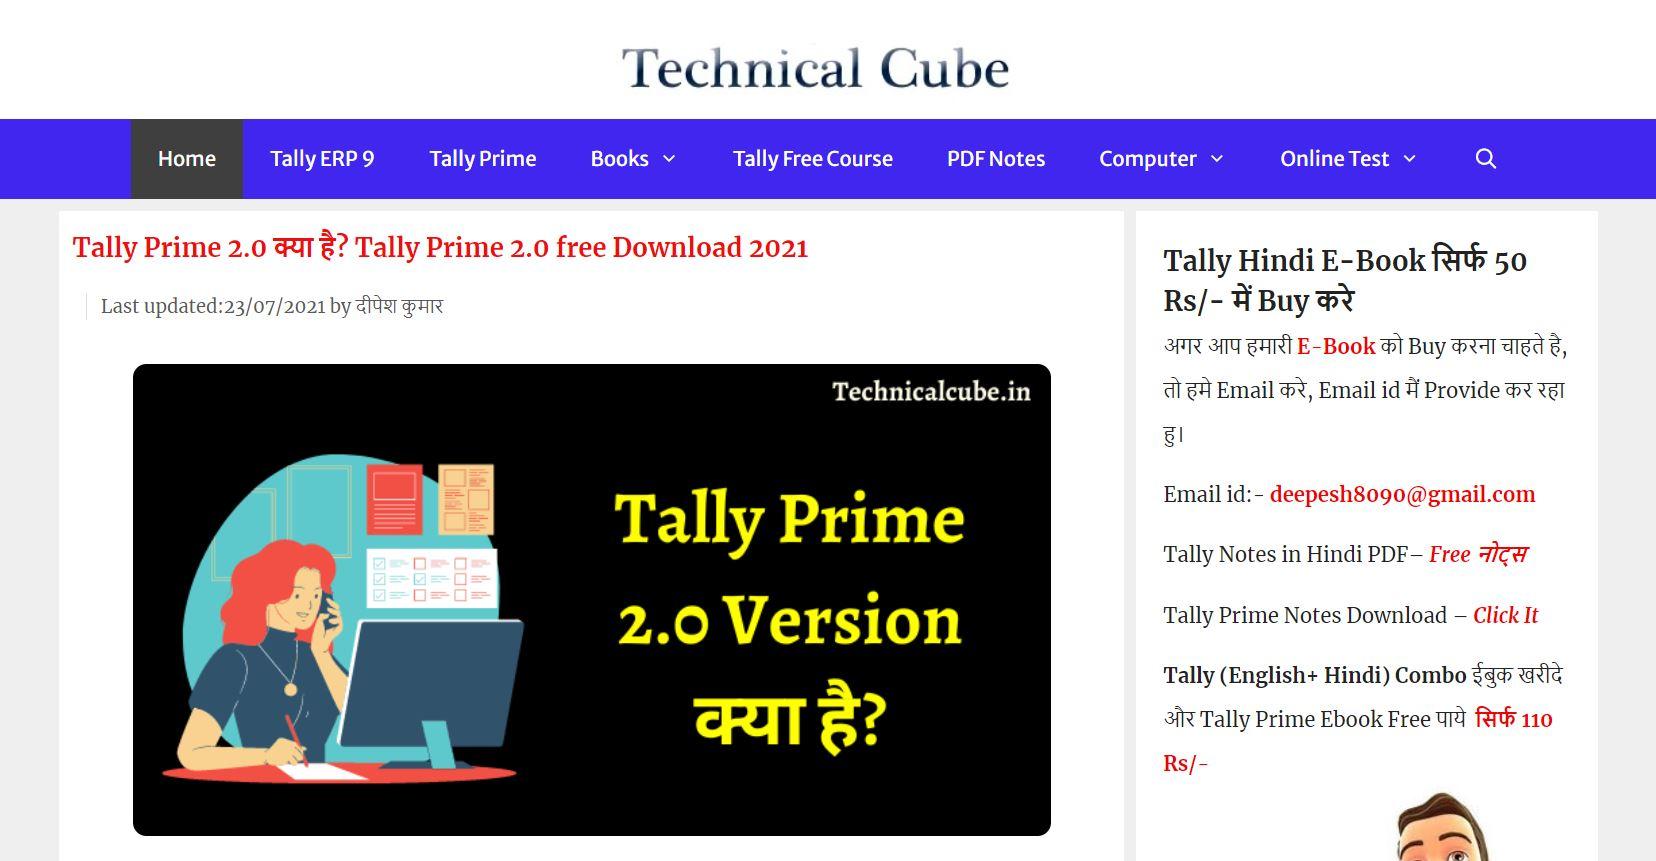 Technicalcube